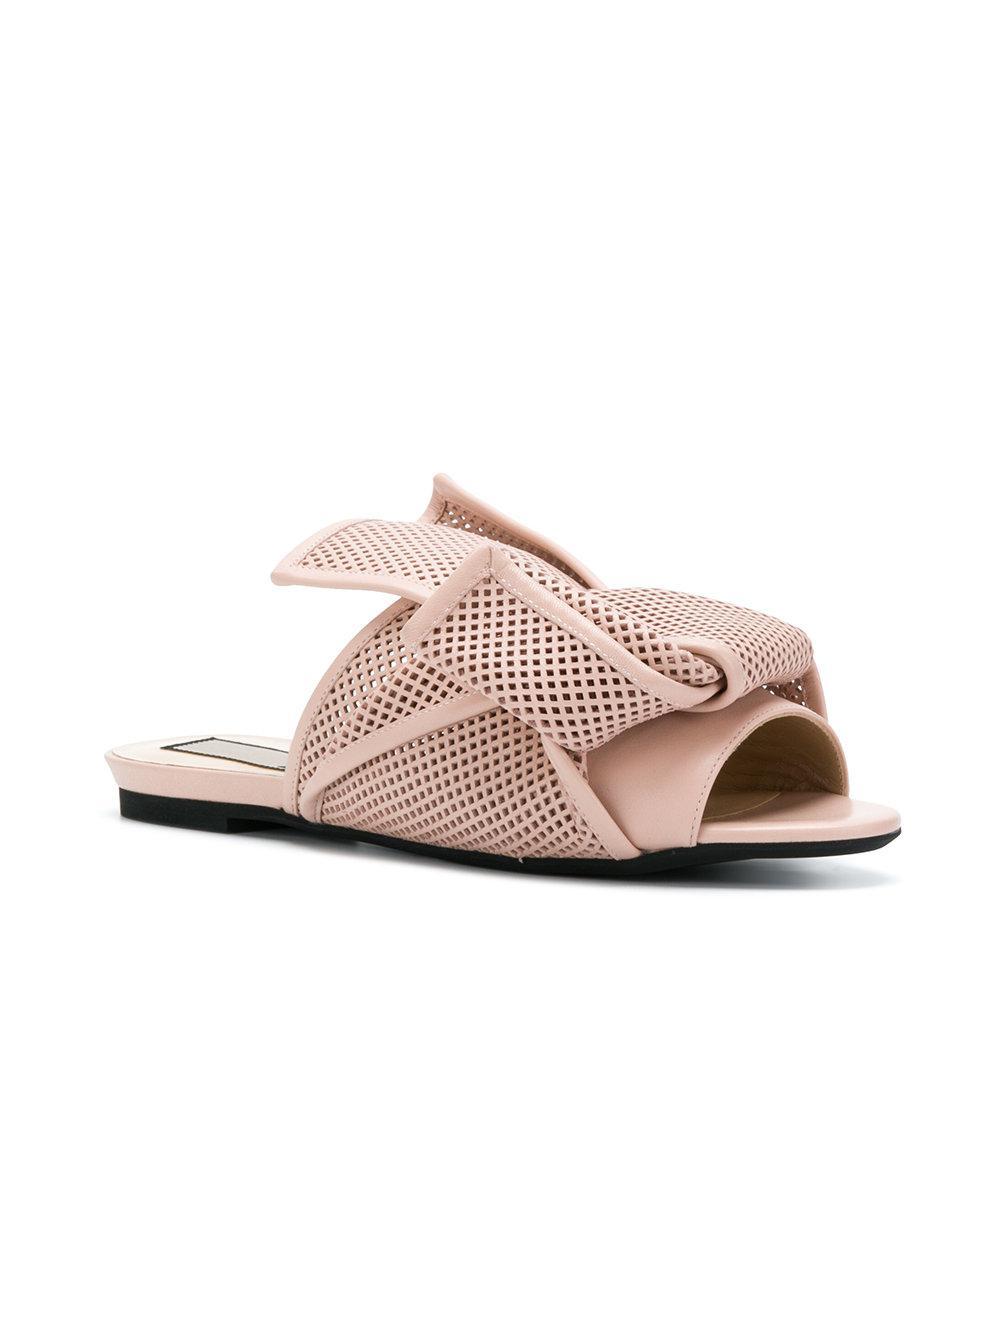 abstract bow mesh sandals - Nude & Neutrals N°21 Huge Surprise Online 5jNtwpdU